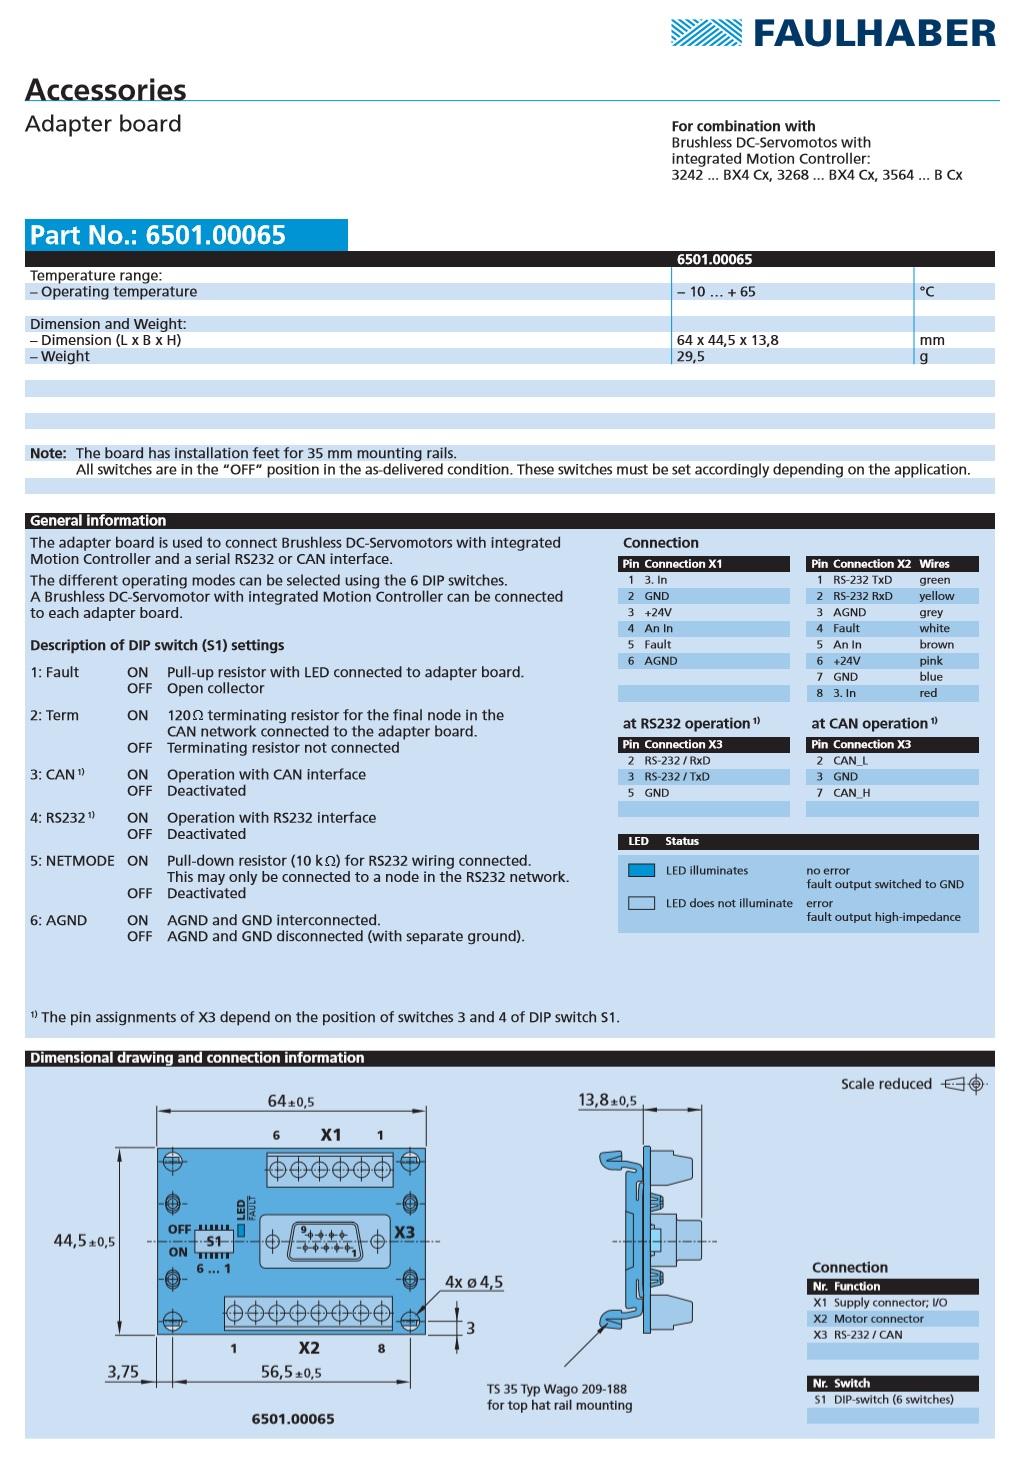 Faulhaber Adaptor Board 6501 00065 Series